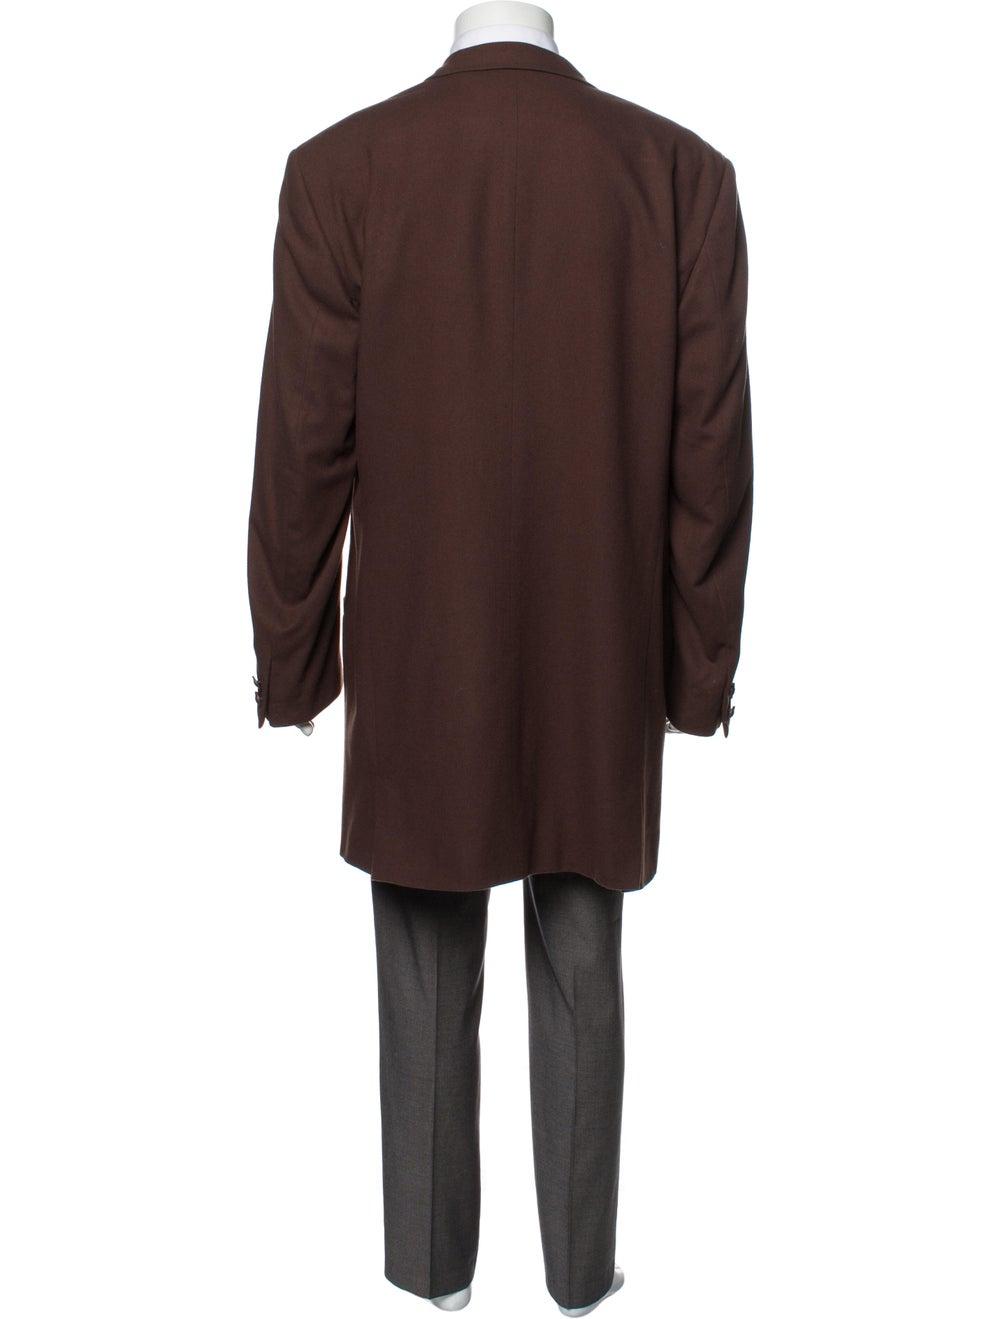 Gianni Versace Vintage Overcoat Brown - image 3